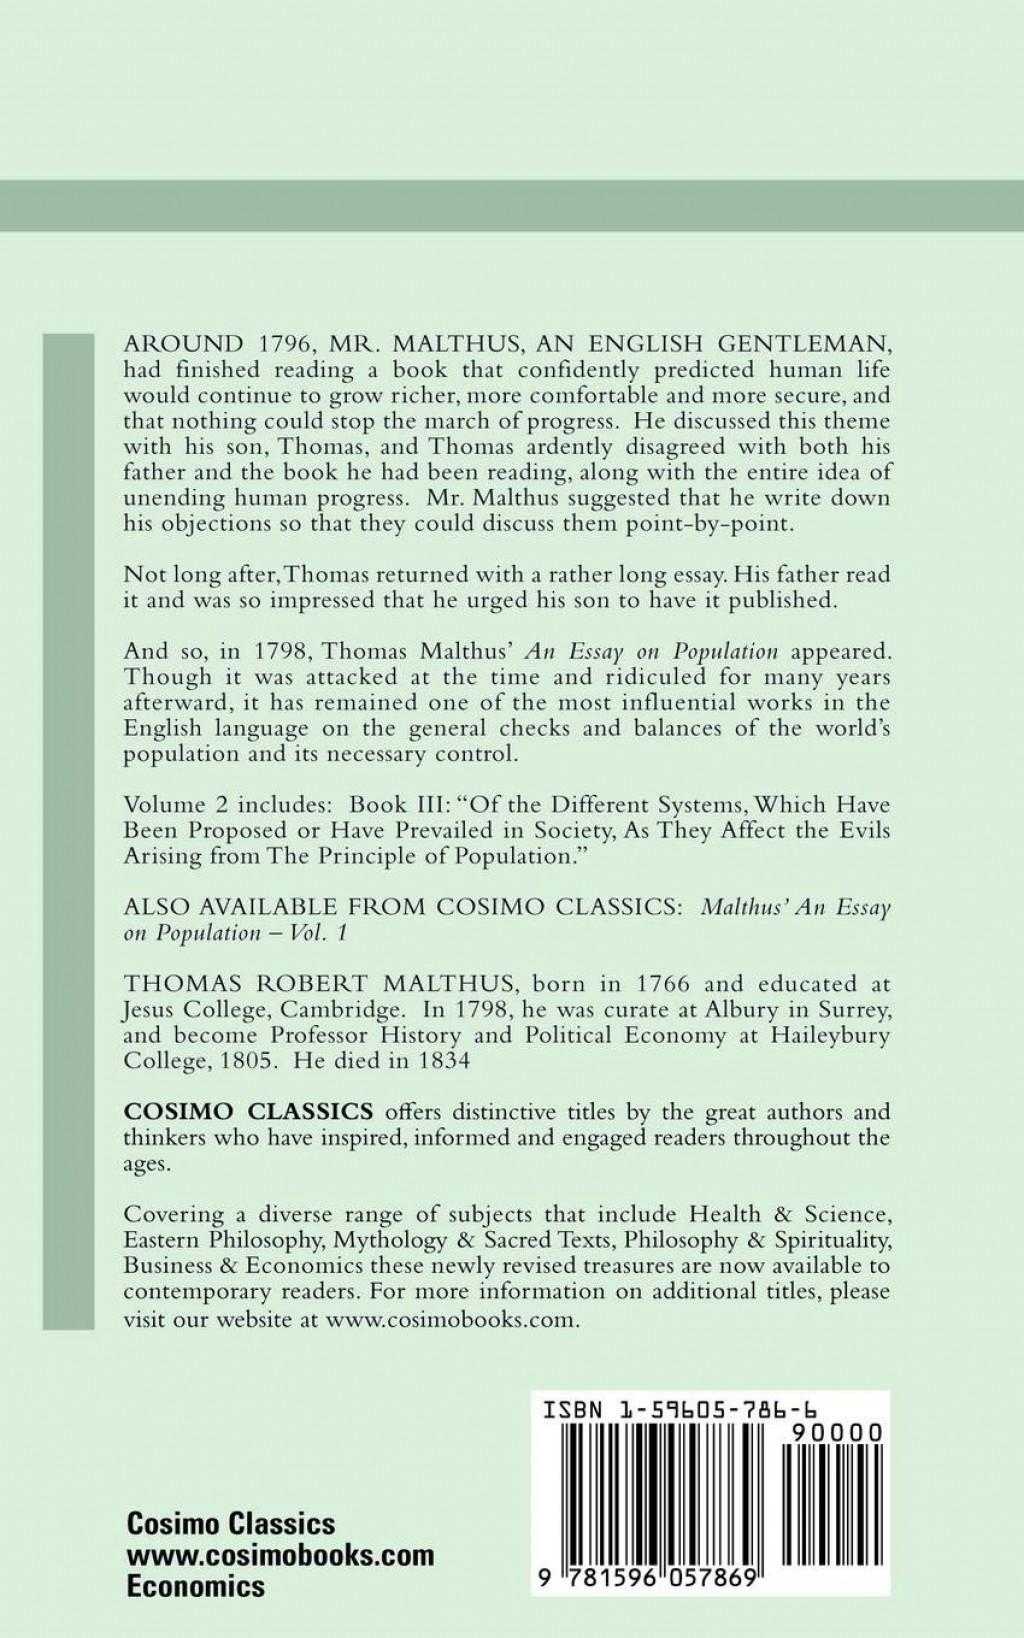 012 Ijdz7bvl Essay Example On Impressive Population Control Explosion In Kannada Pakistan Large